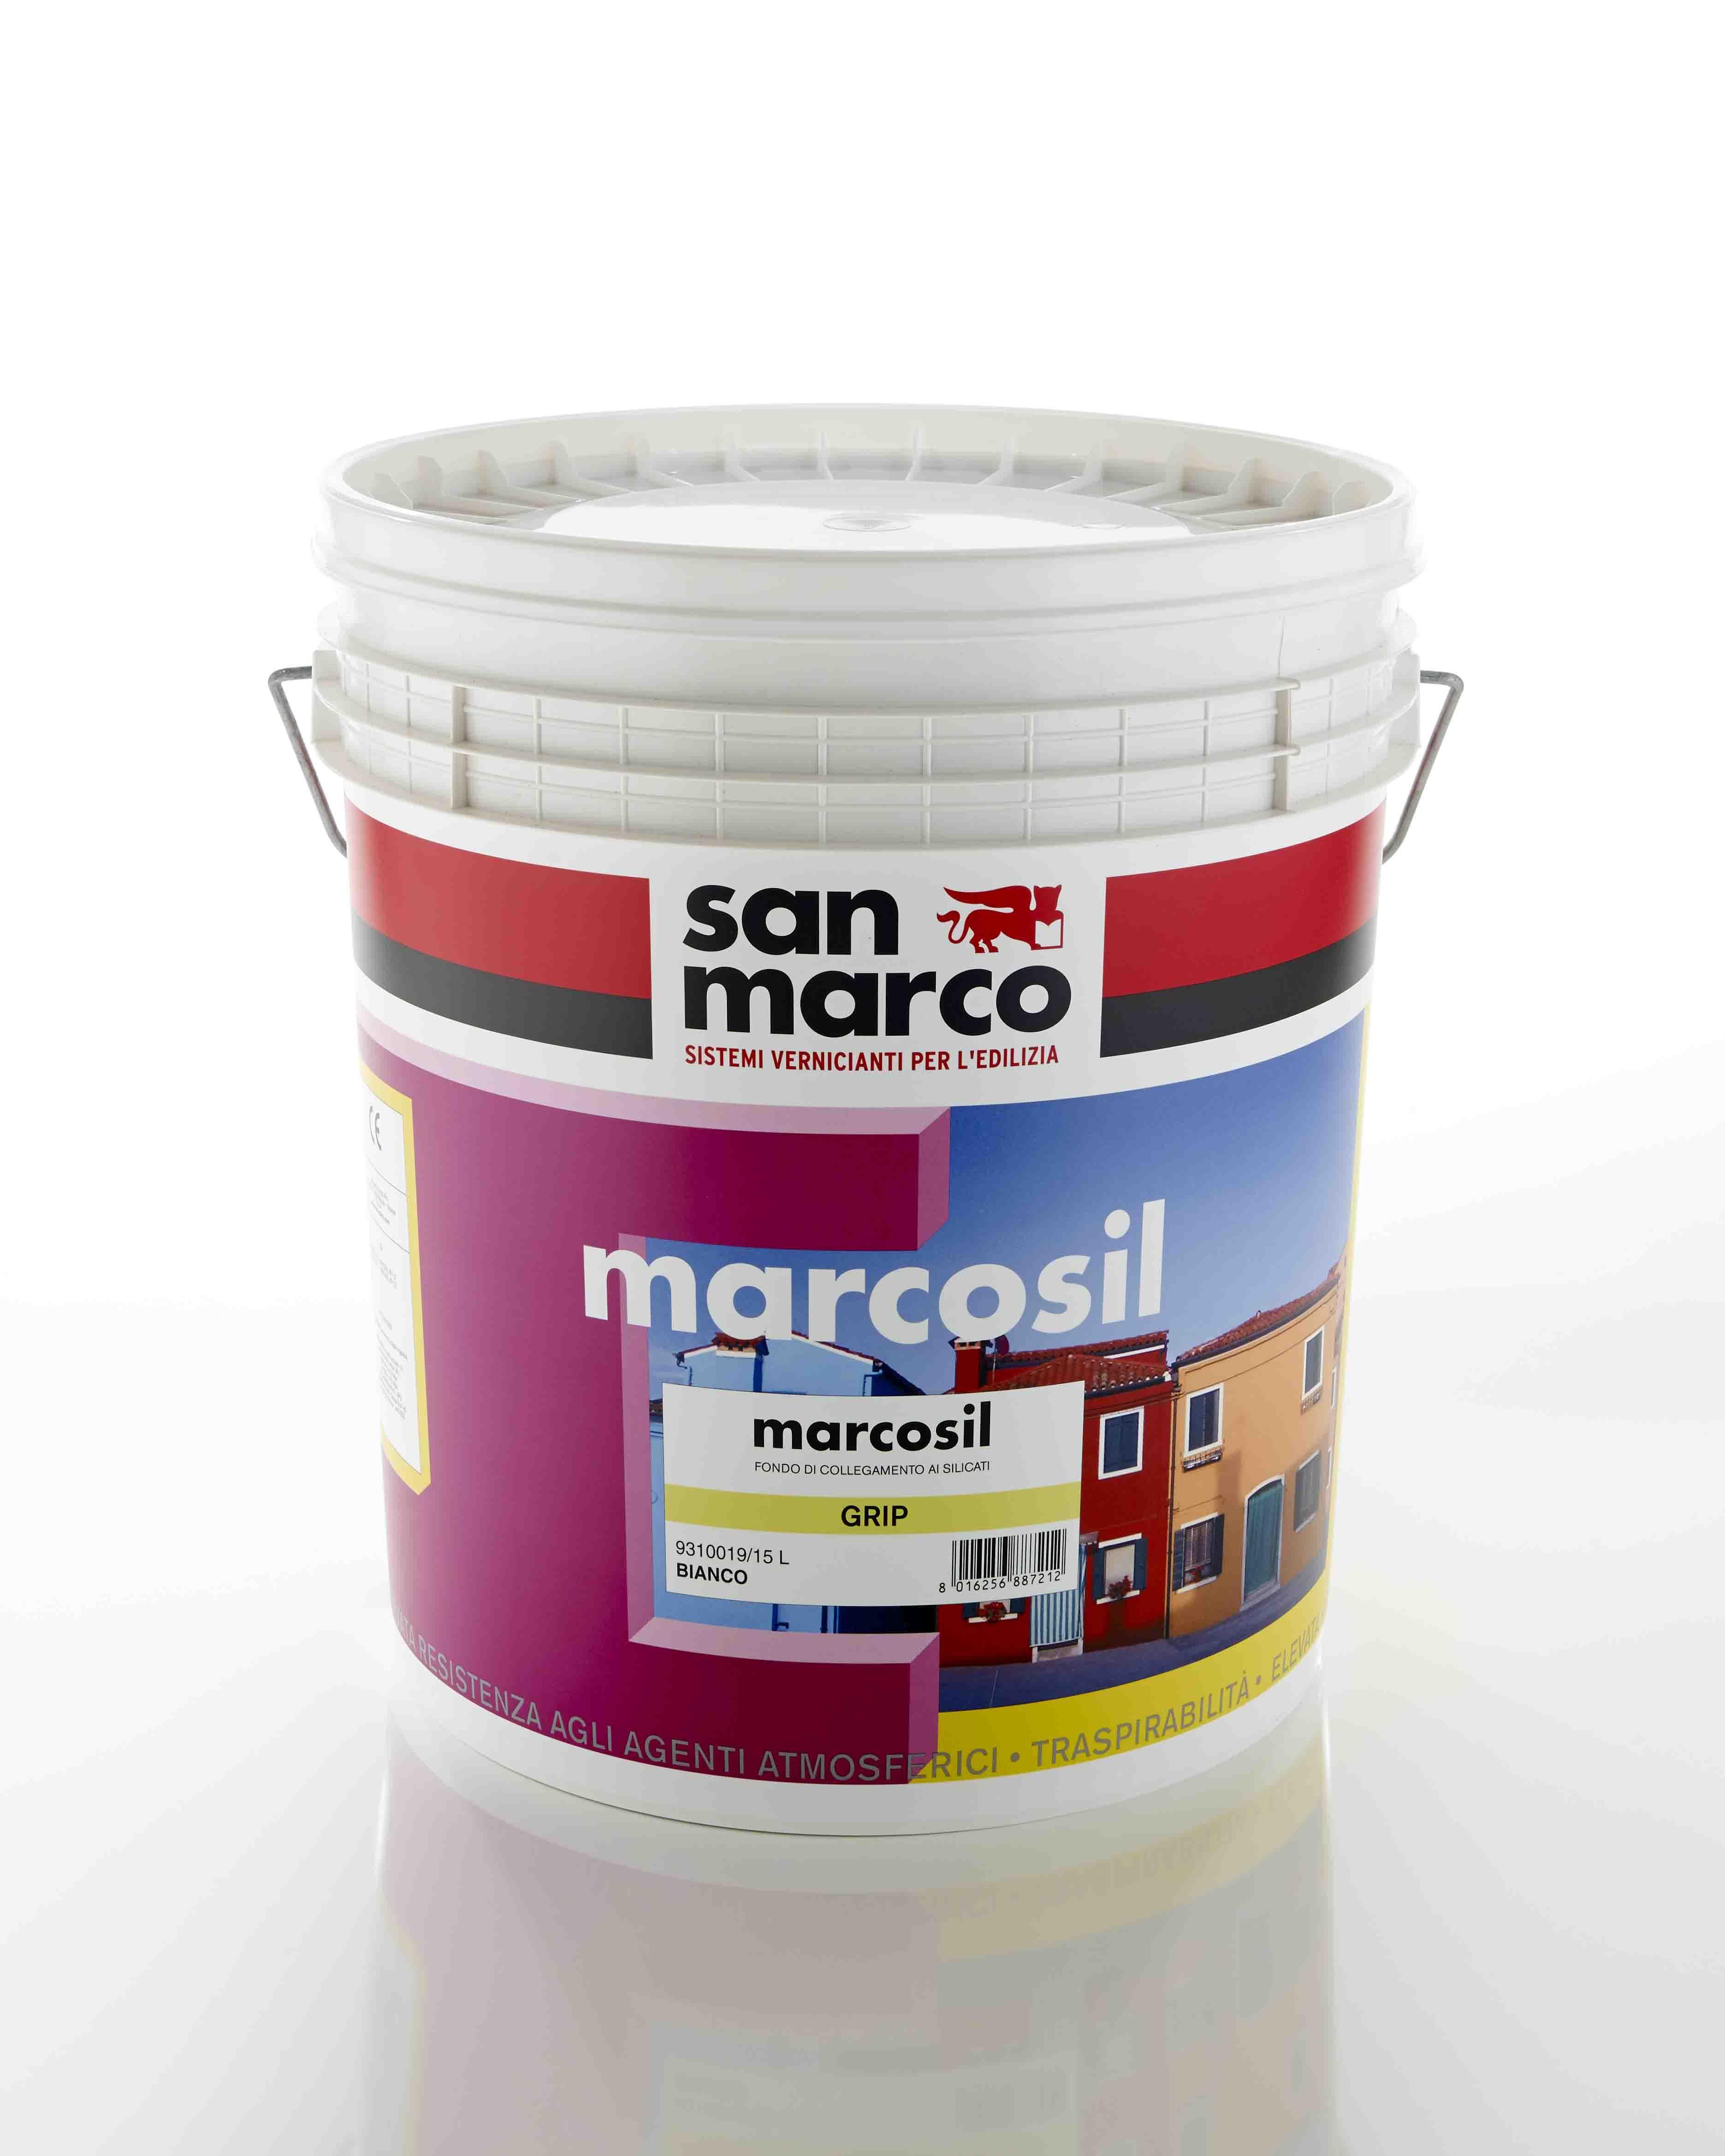 MARCOSIL GRIP